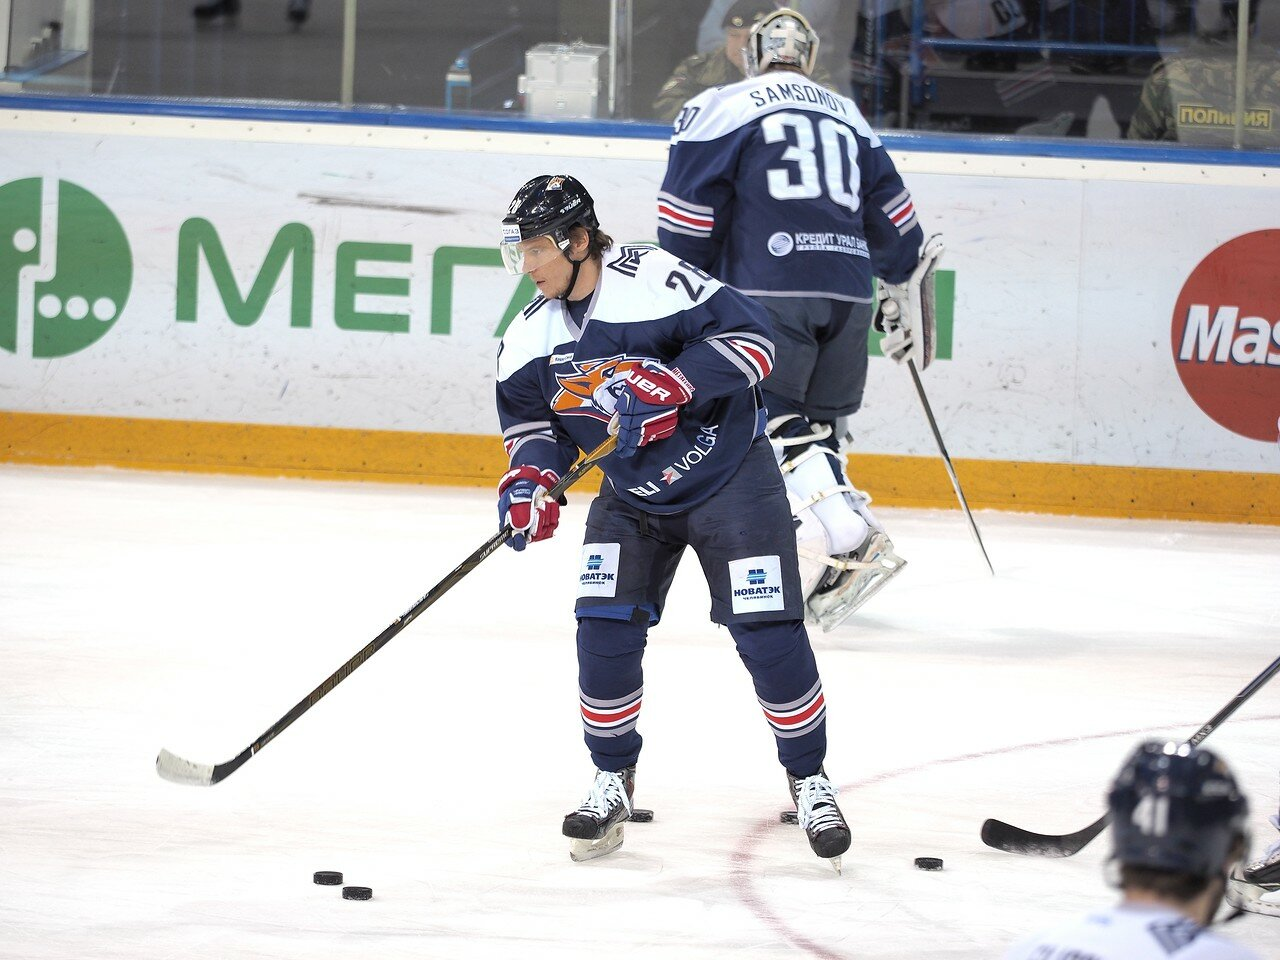 36Плей-офф 2016 Восток 1/2 Металлург - Сибирь 16.03.2016